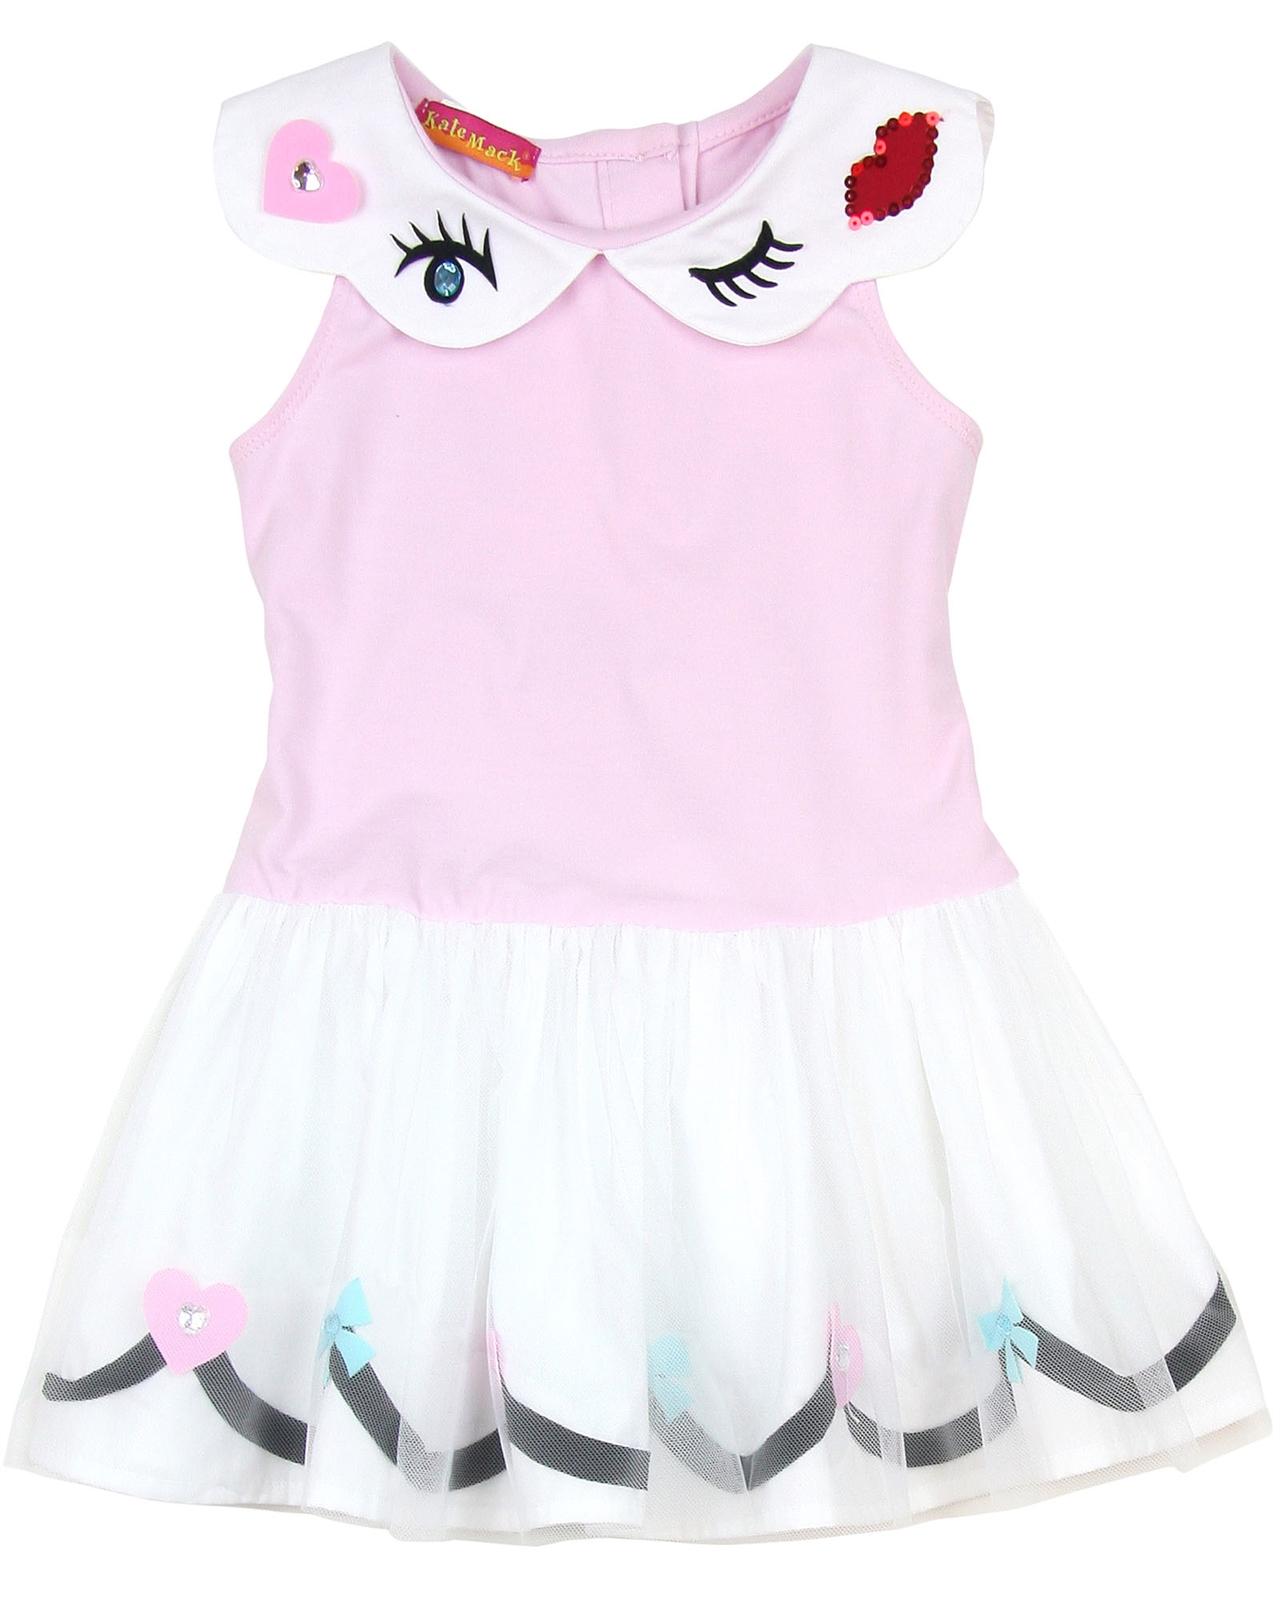 98cec53b0 Kate Mack Girls' Drop Waist Dress Oodles of Doodles Pink | Biscotti ...